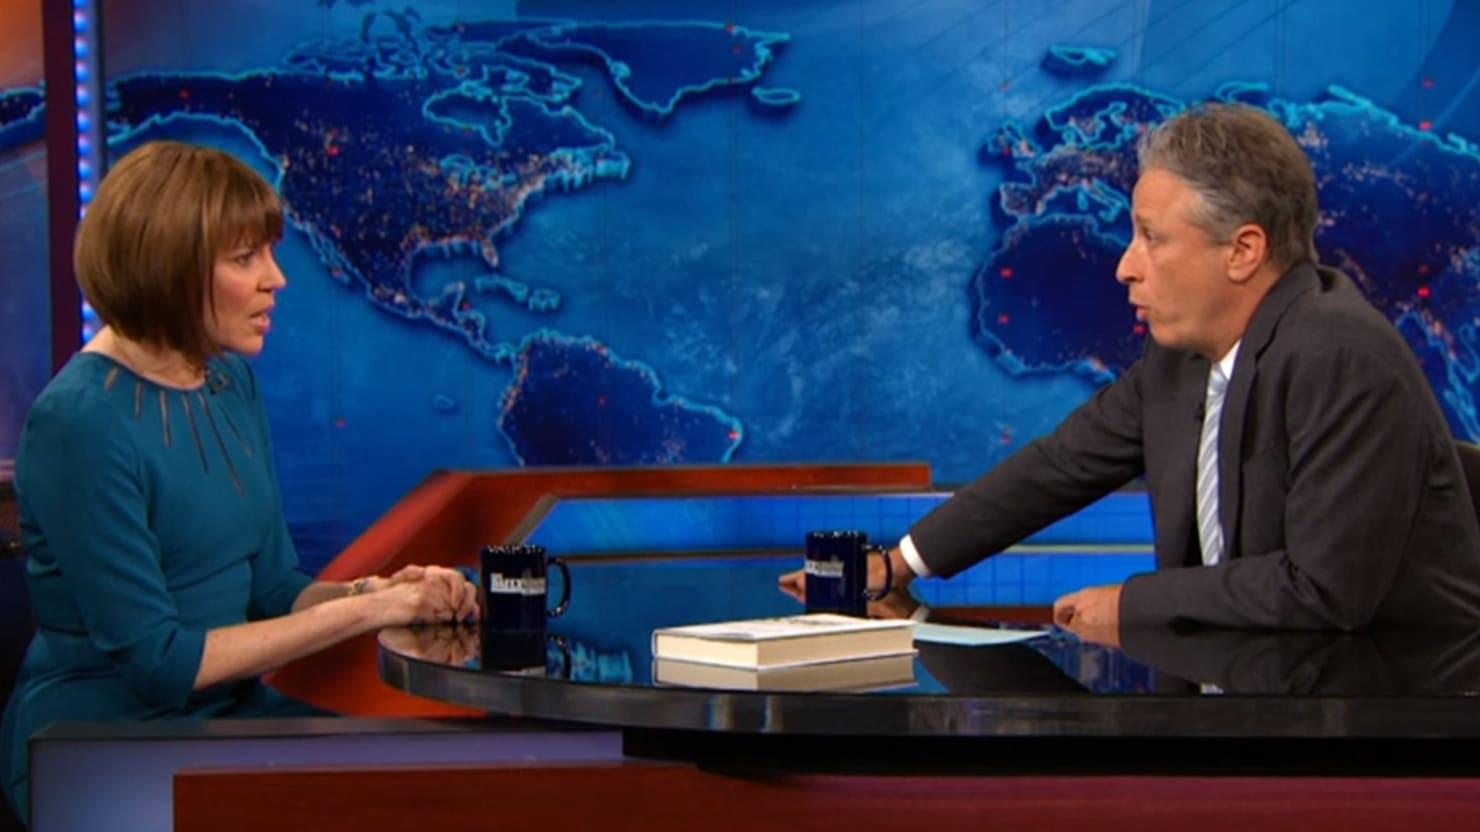 Jon Stewart Grills Judith Miller on Iraq, She Blames the Clintons